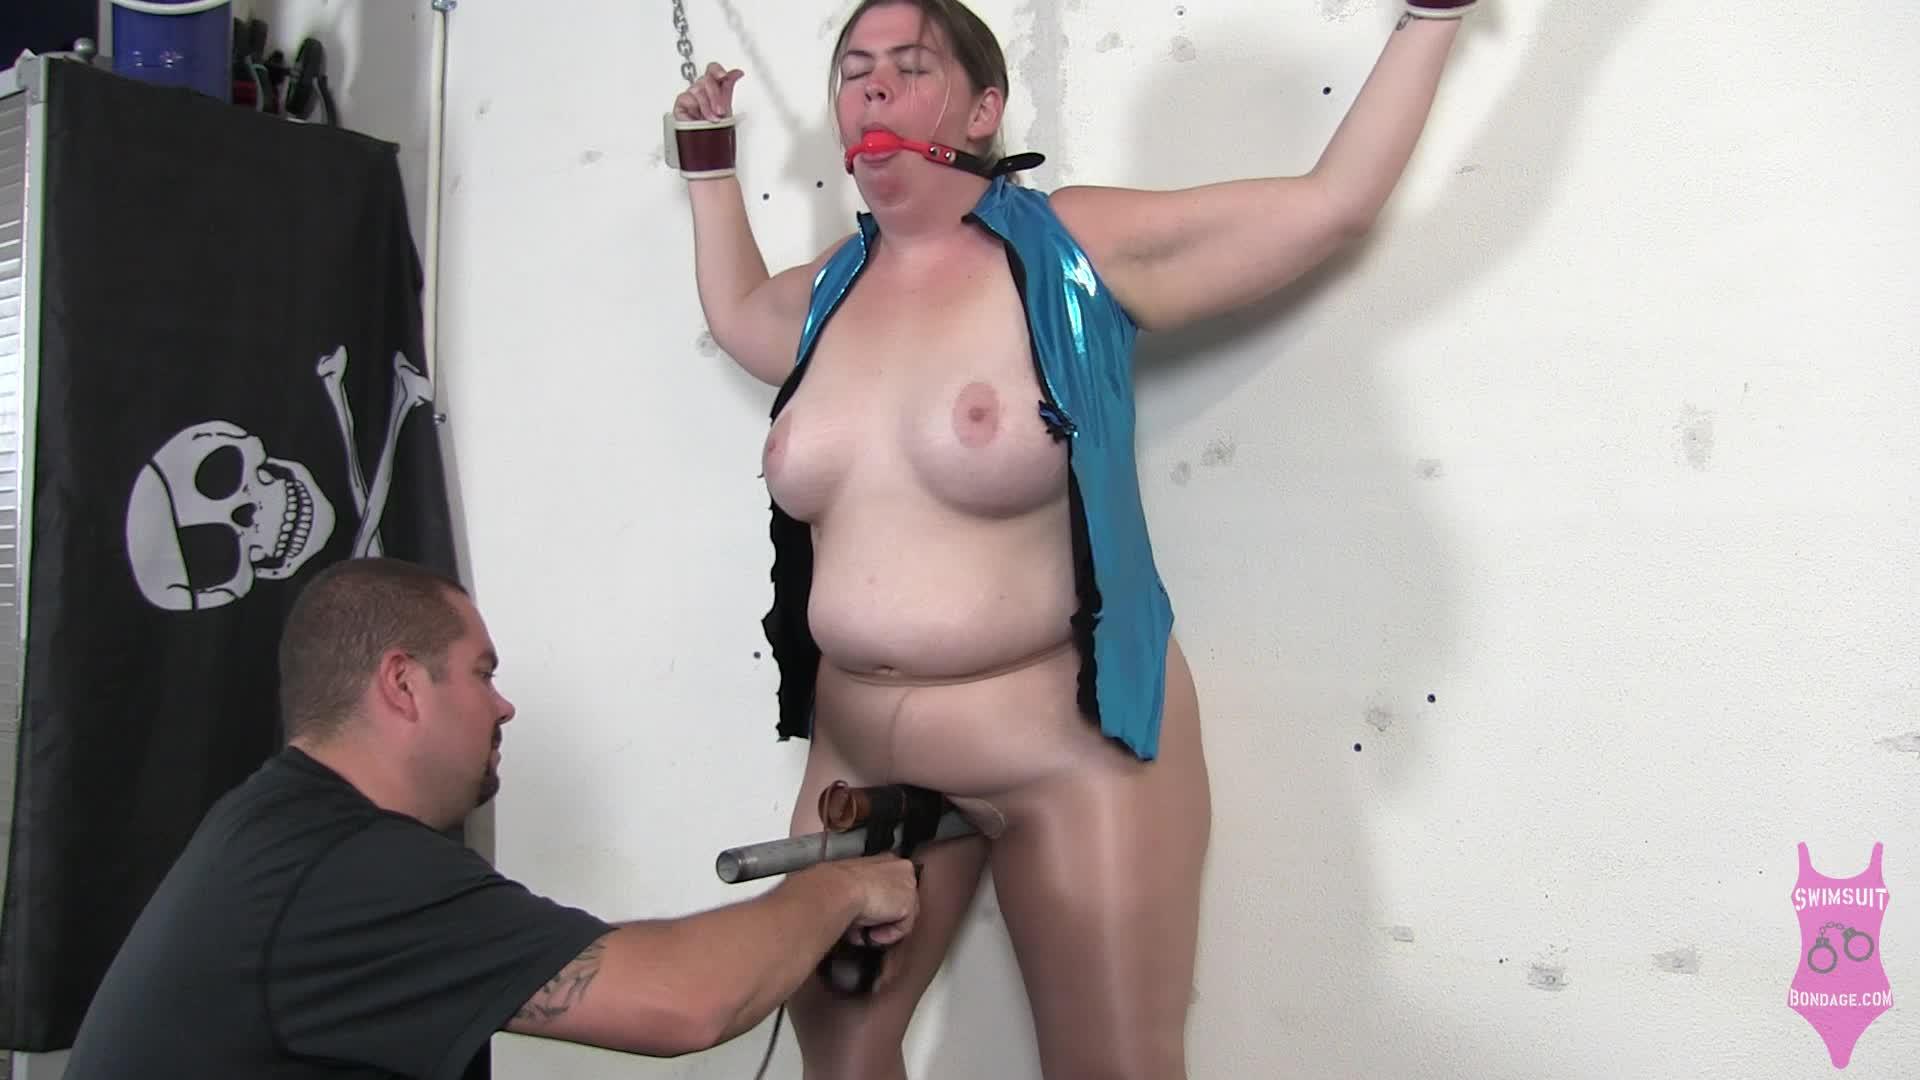 hot girl caught cheating